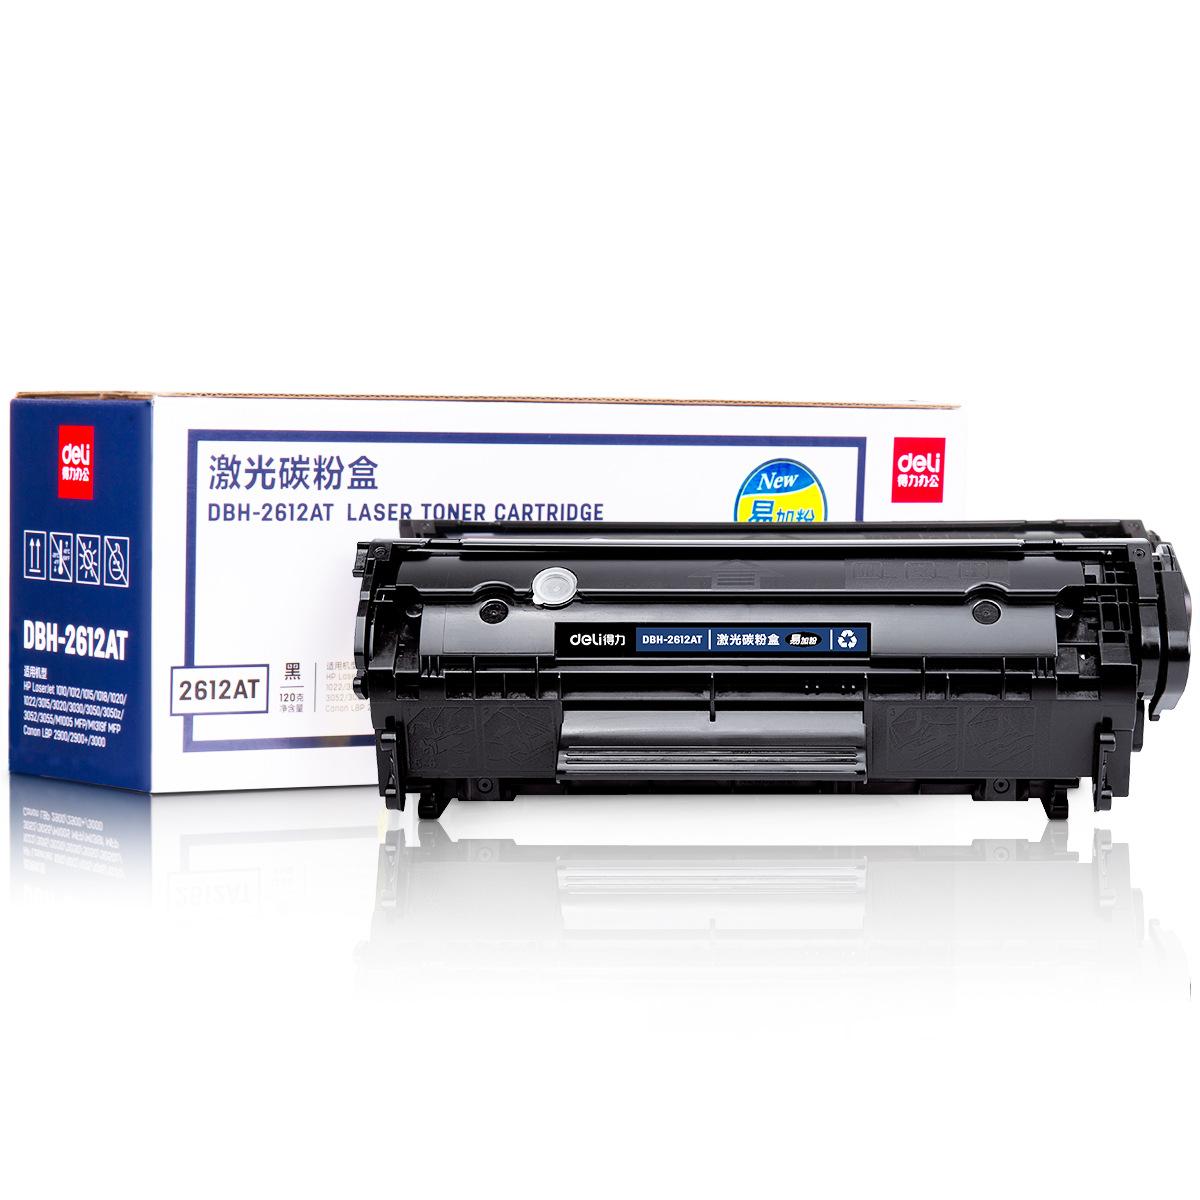 DELI Hộp mực than Máy in laser DBH-2612AT hộp mực máy in laser HP1020 HP1005 HP10